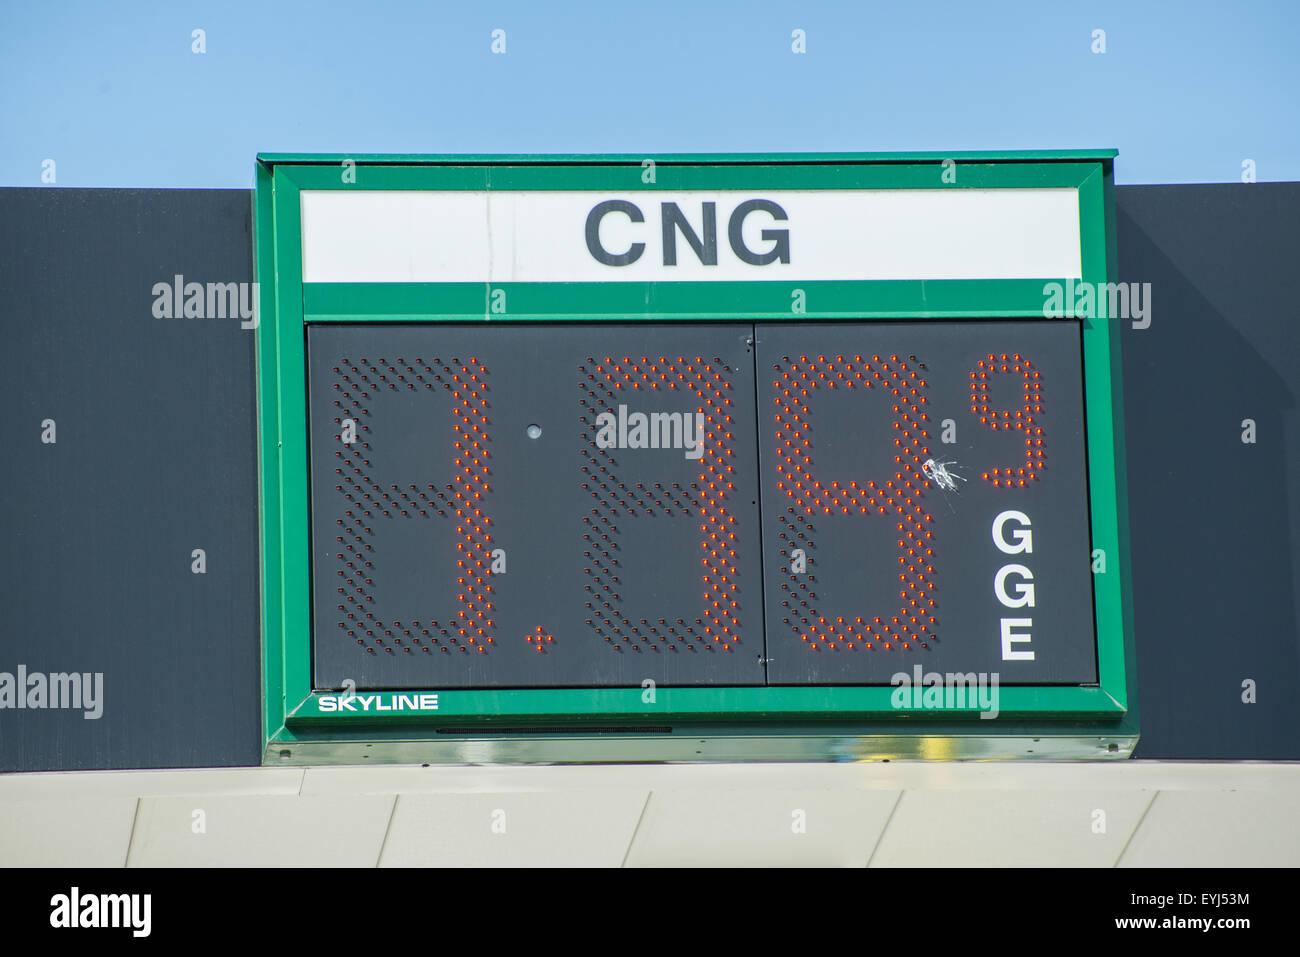 Compressed Natural Gas Filling Station Price Sign - Salt Lake City - utah - Stock Image